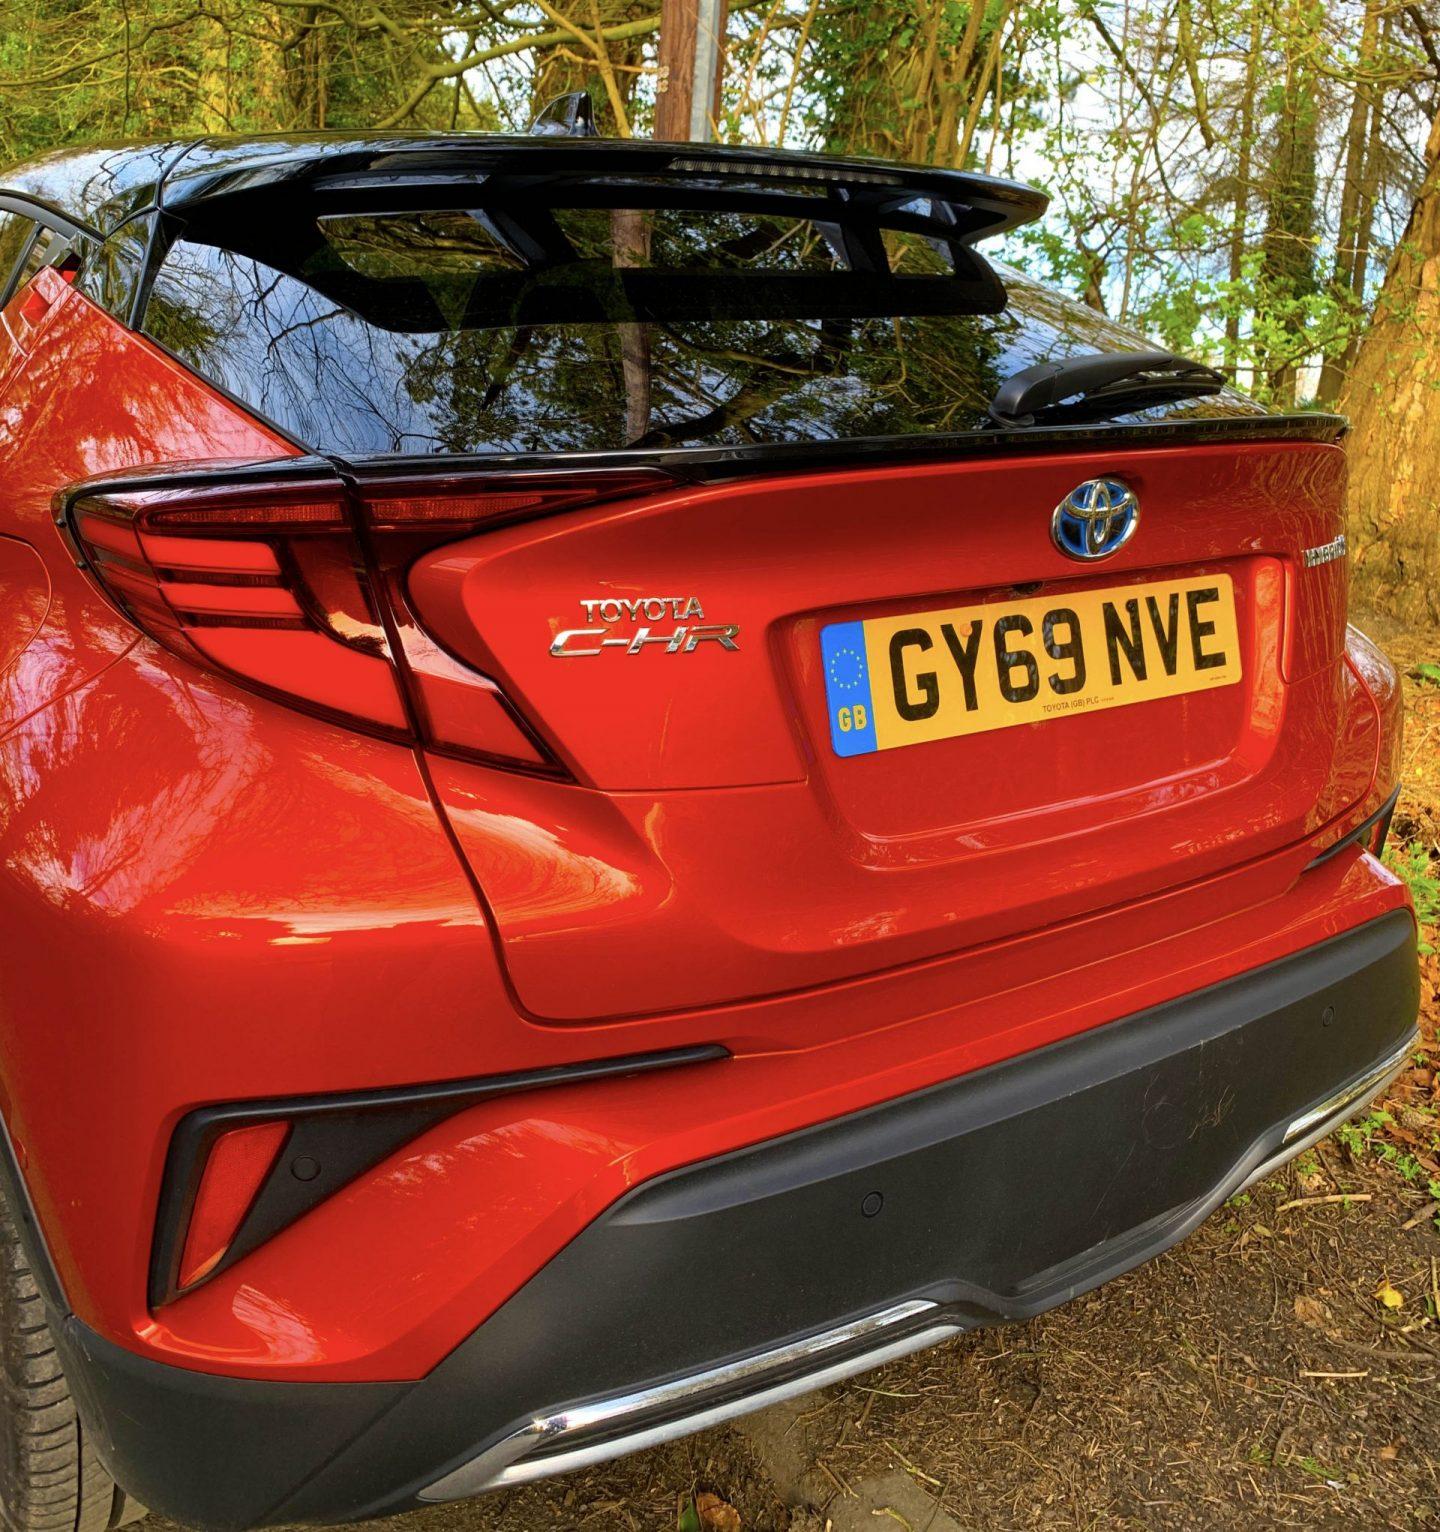 Toyota hybrid, Hybrid SUV, Toyota SUV, family car, family cars, Toyota C-HR review